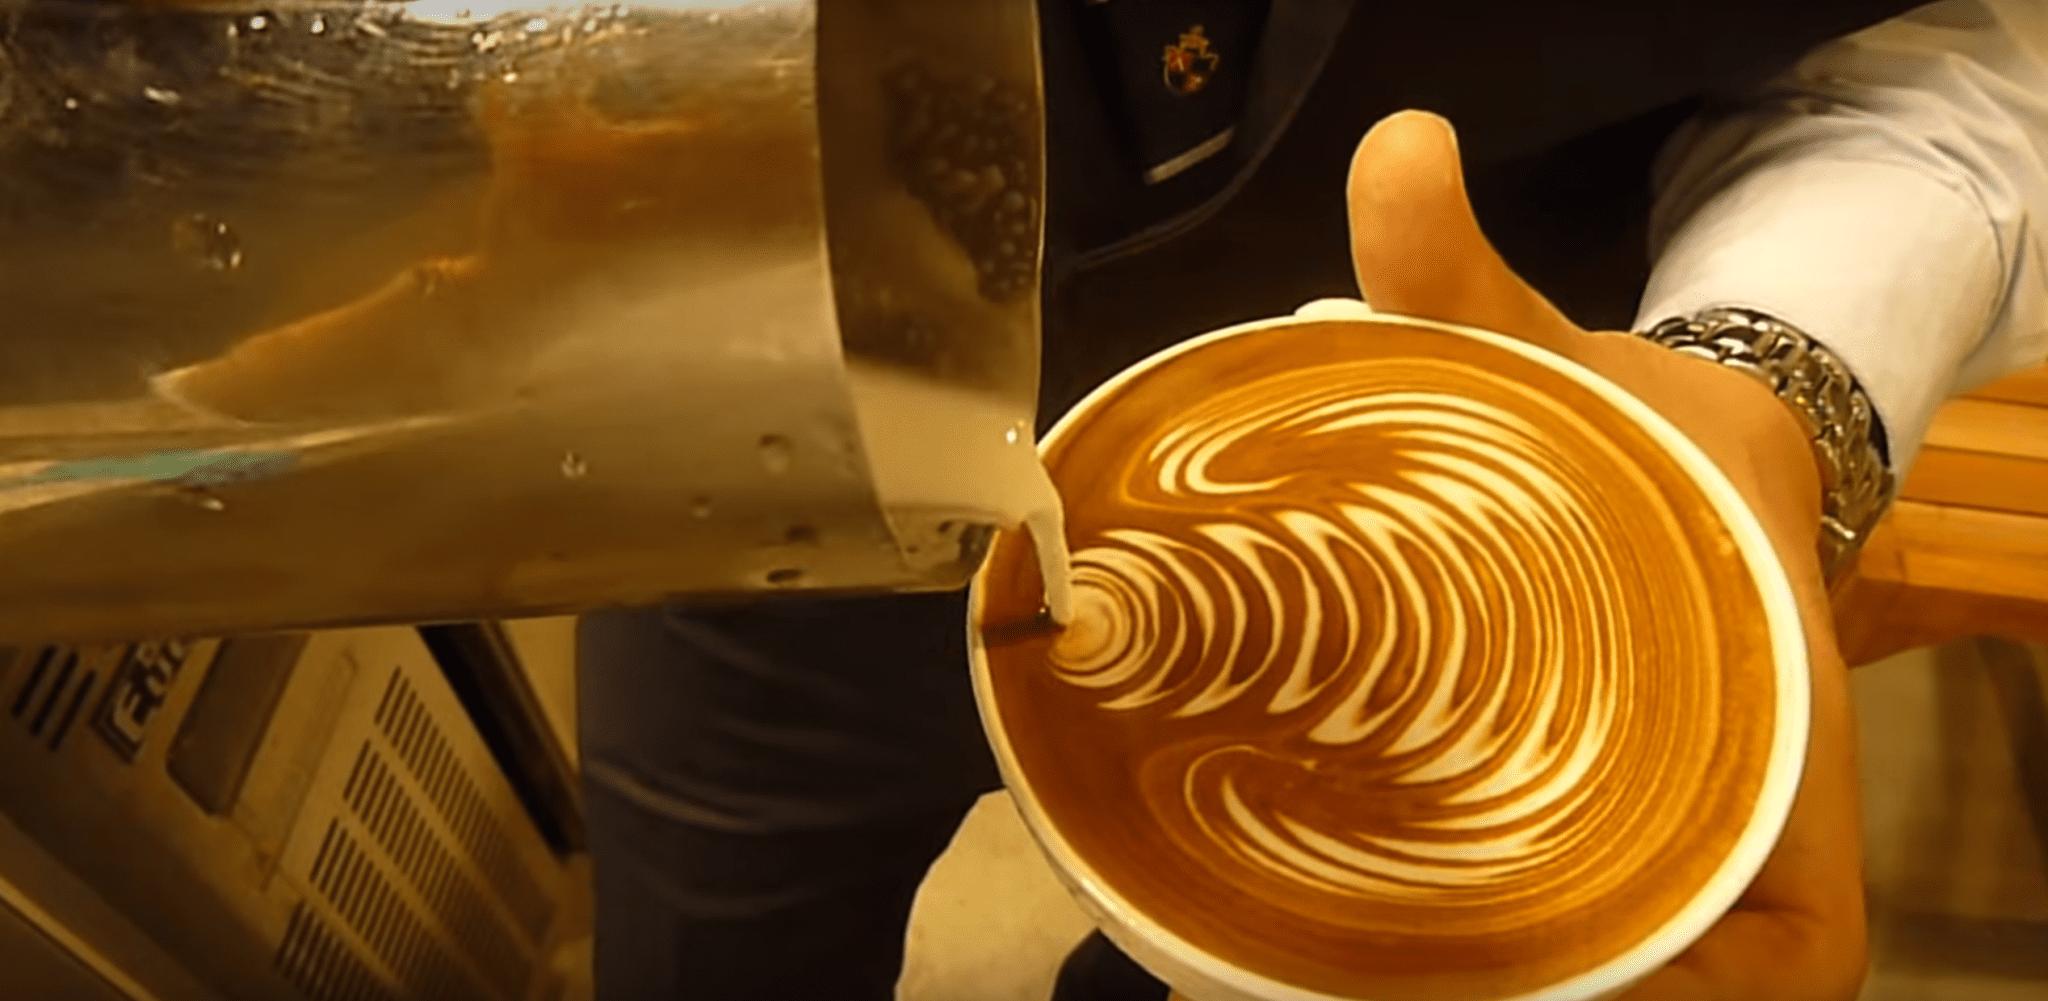 latte art free pour rosetta